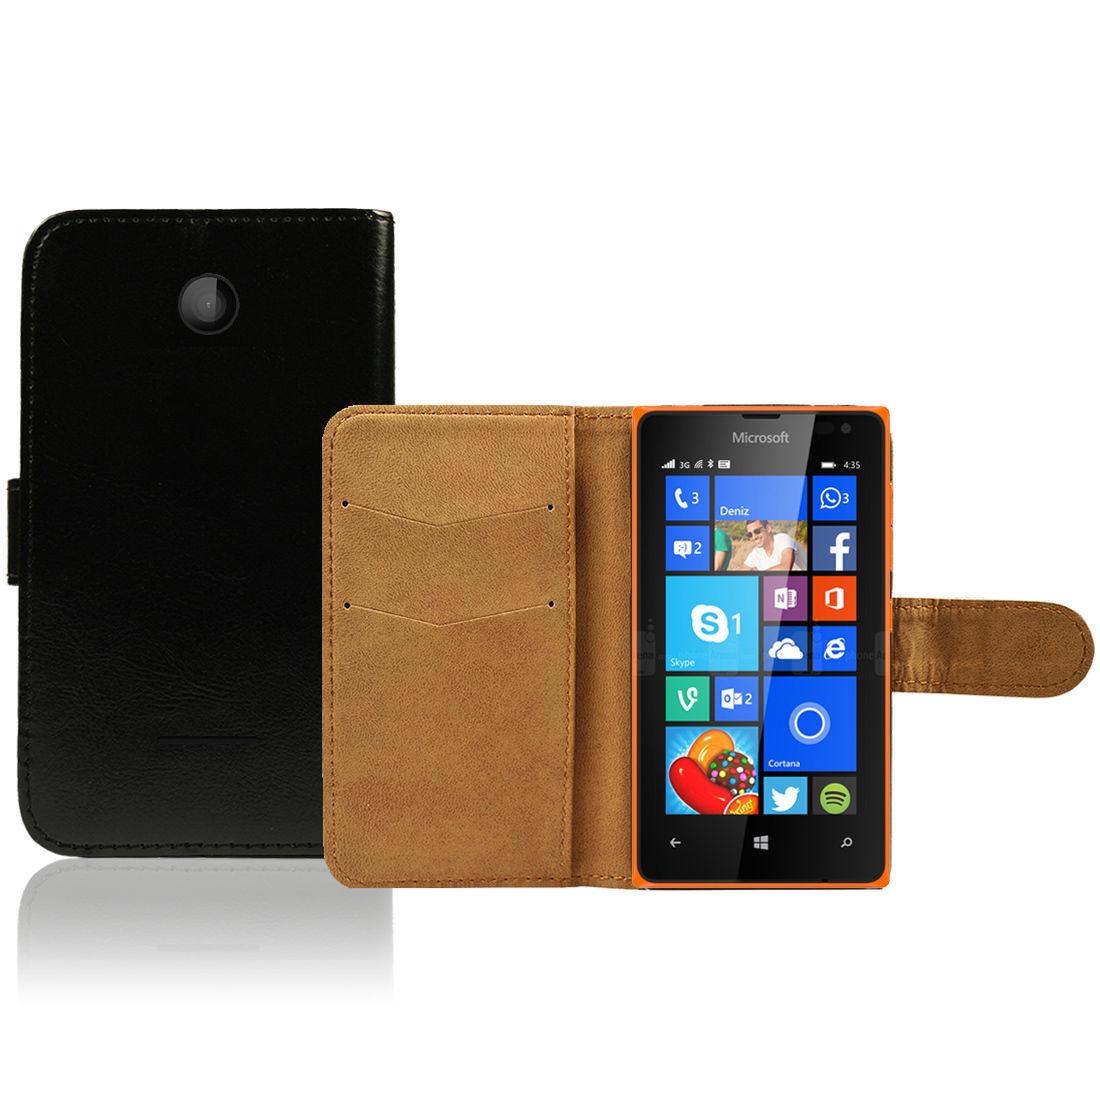 Pouzdro pro Microsoft Lumia 435 černé